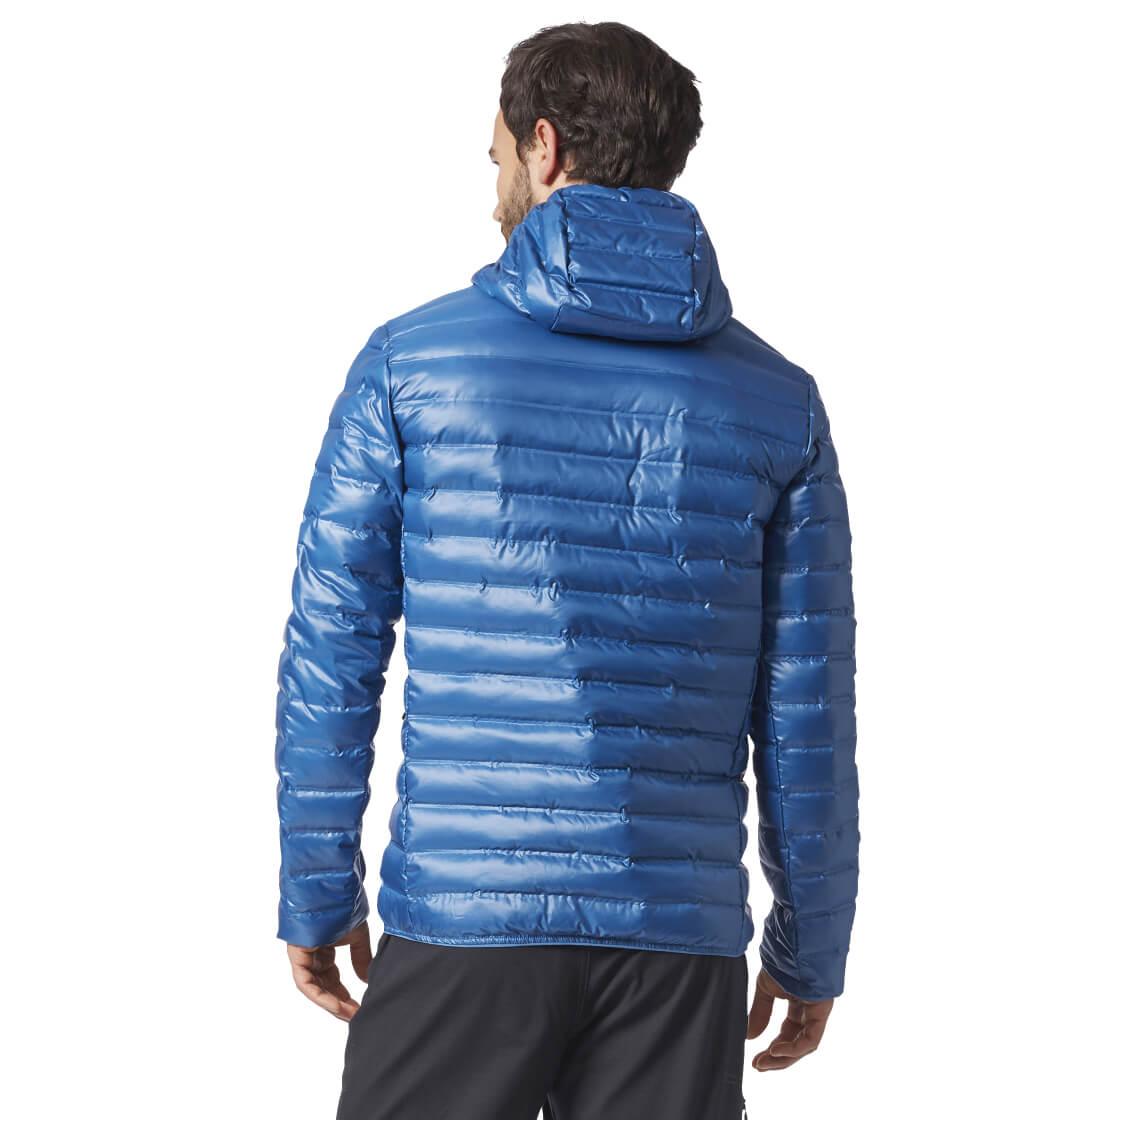 Caliza Golpe fuerte Adelaida  chaqueta adidas terrex coupon for 263f2 31fba